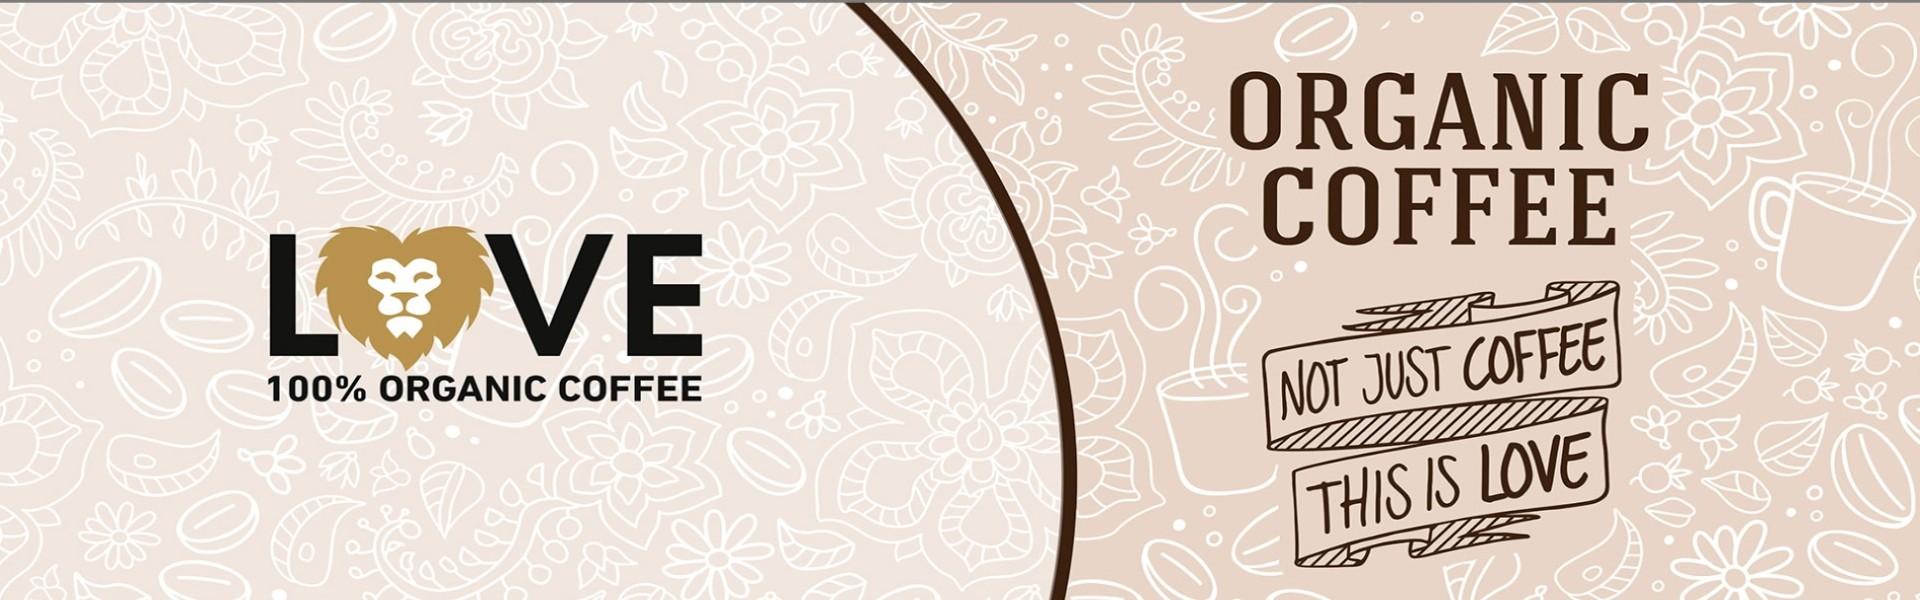 Love Fairtrade Koffie